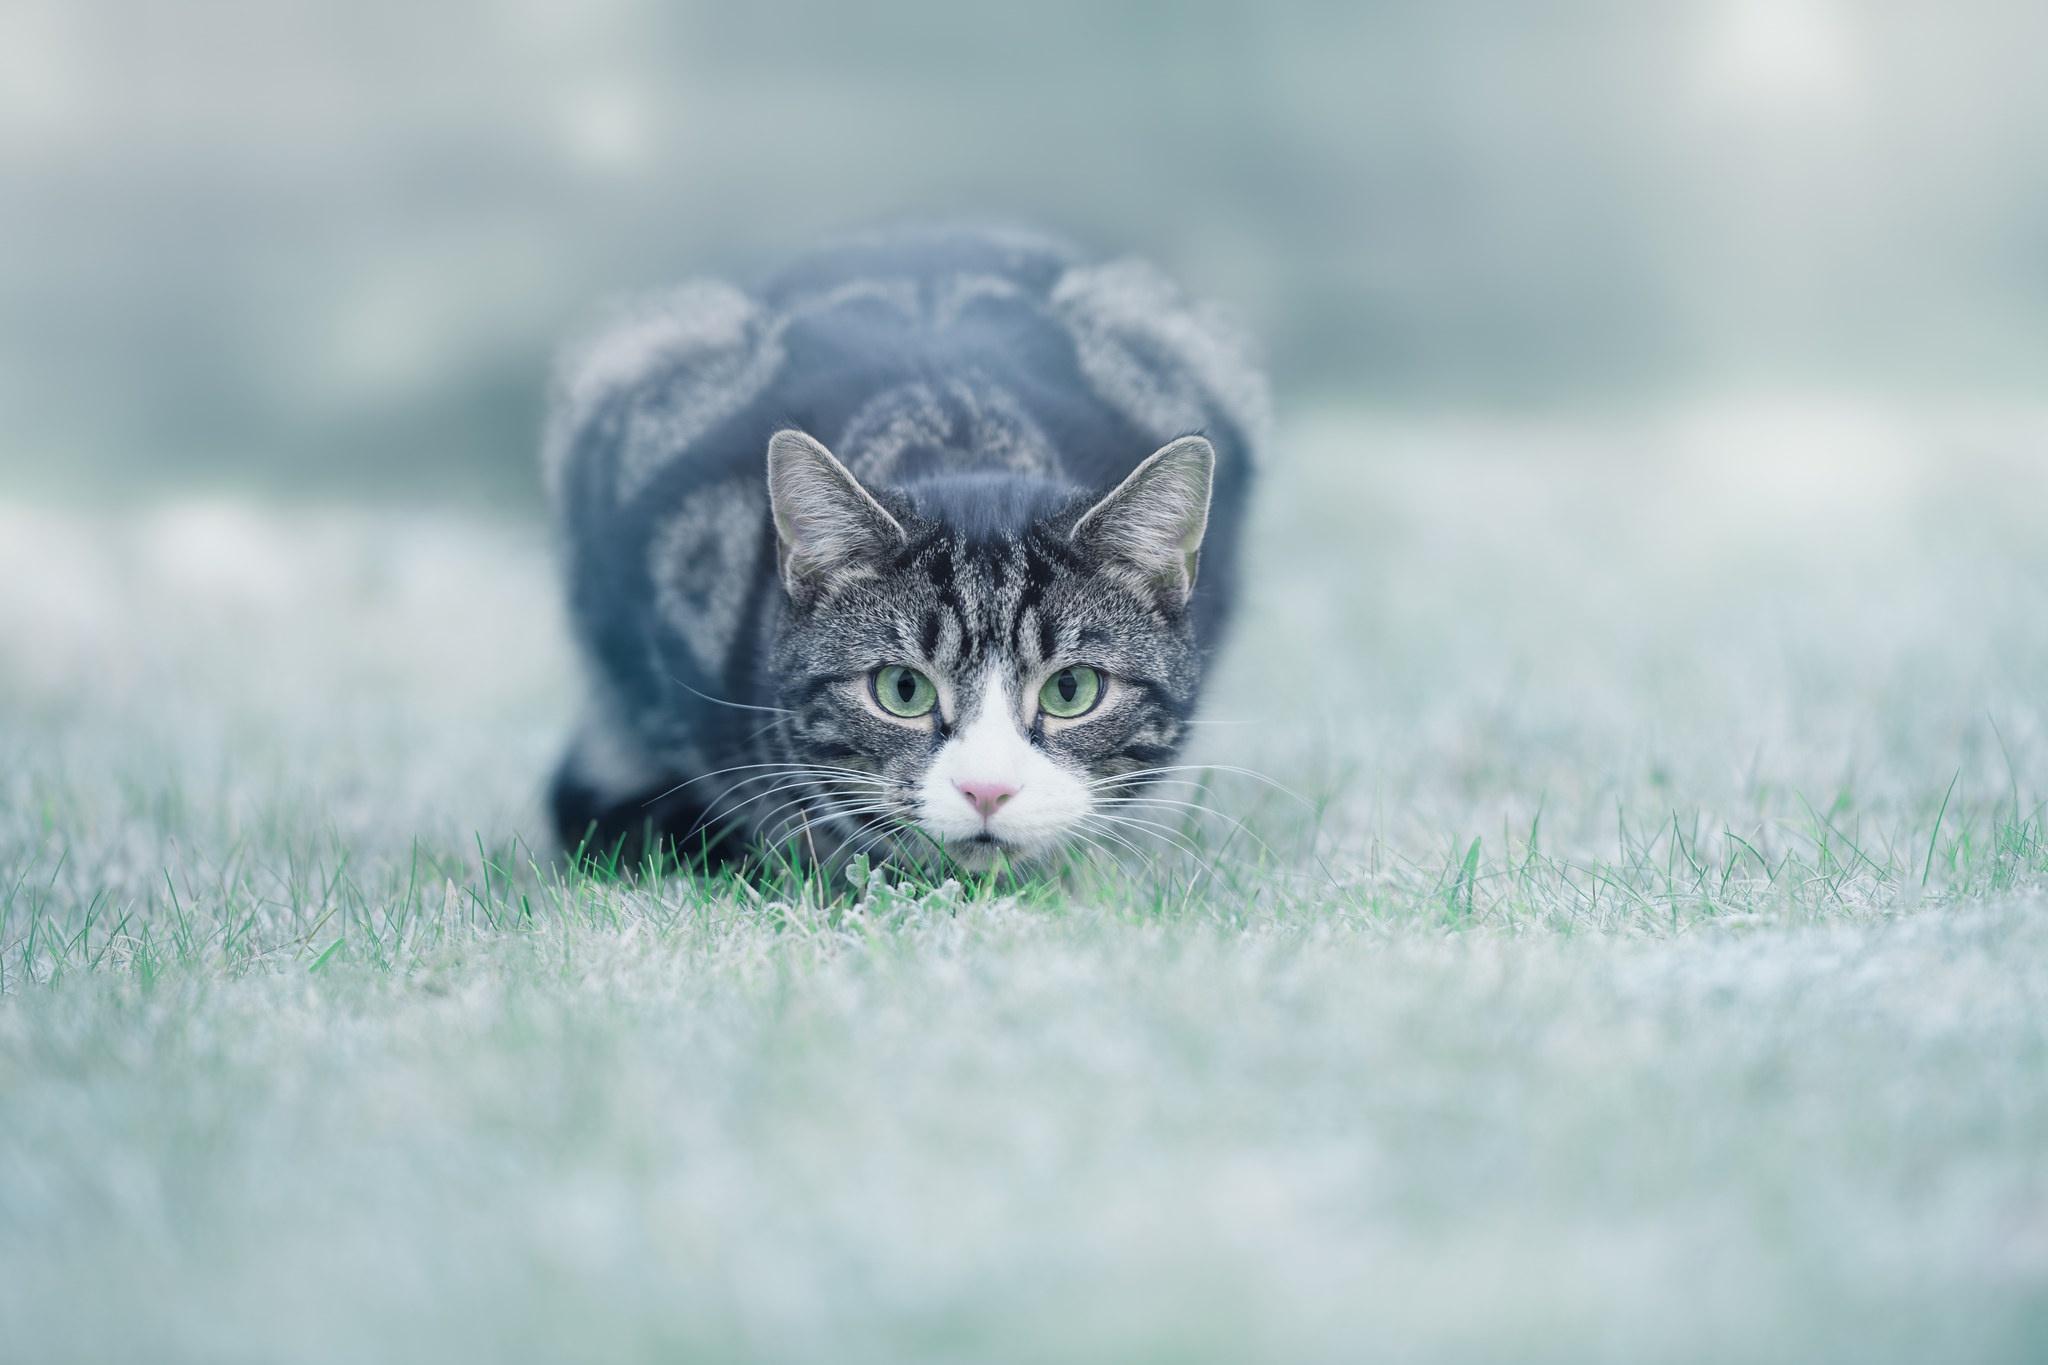 General 2048x1365 animals cats grass